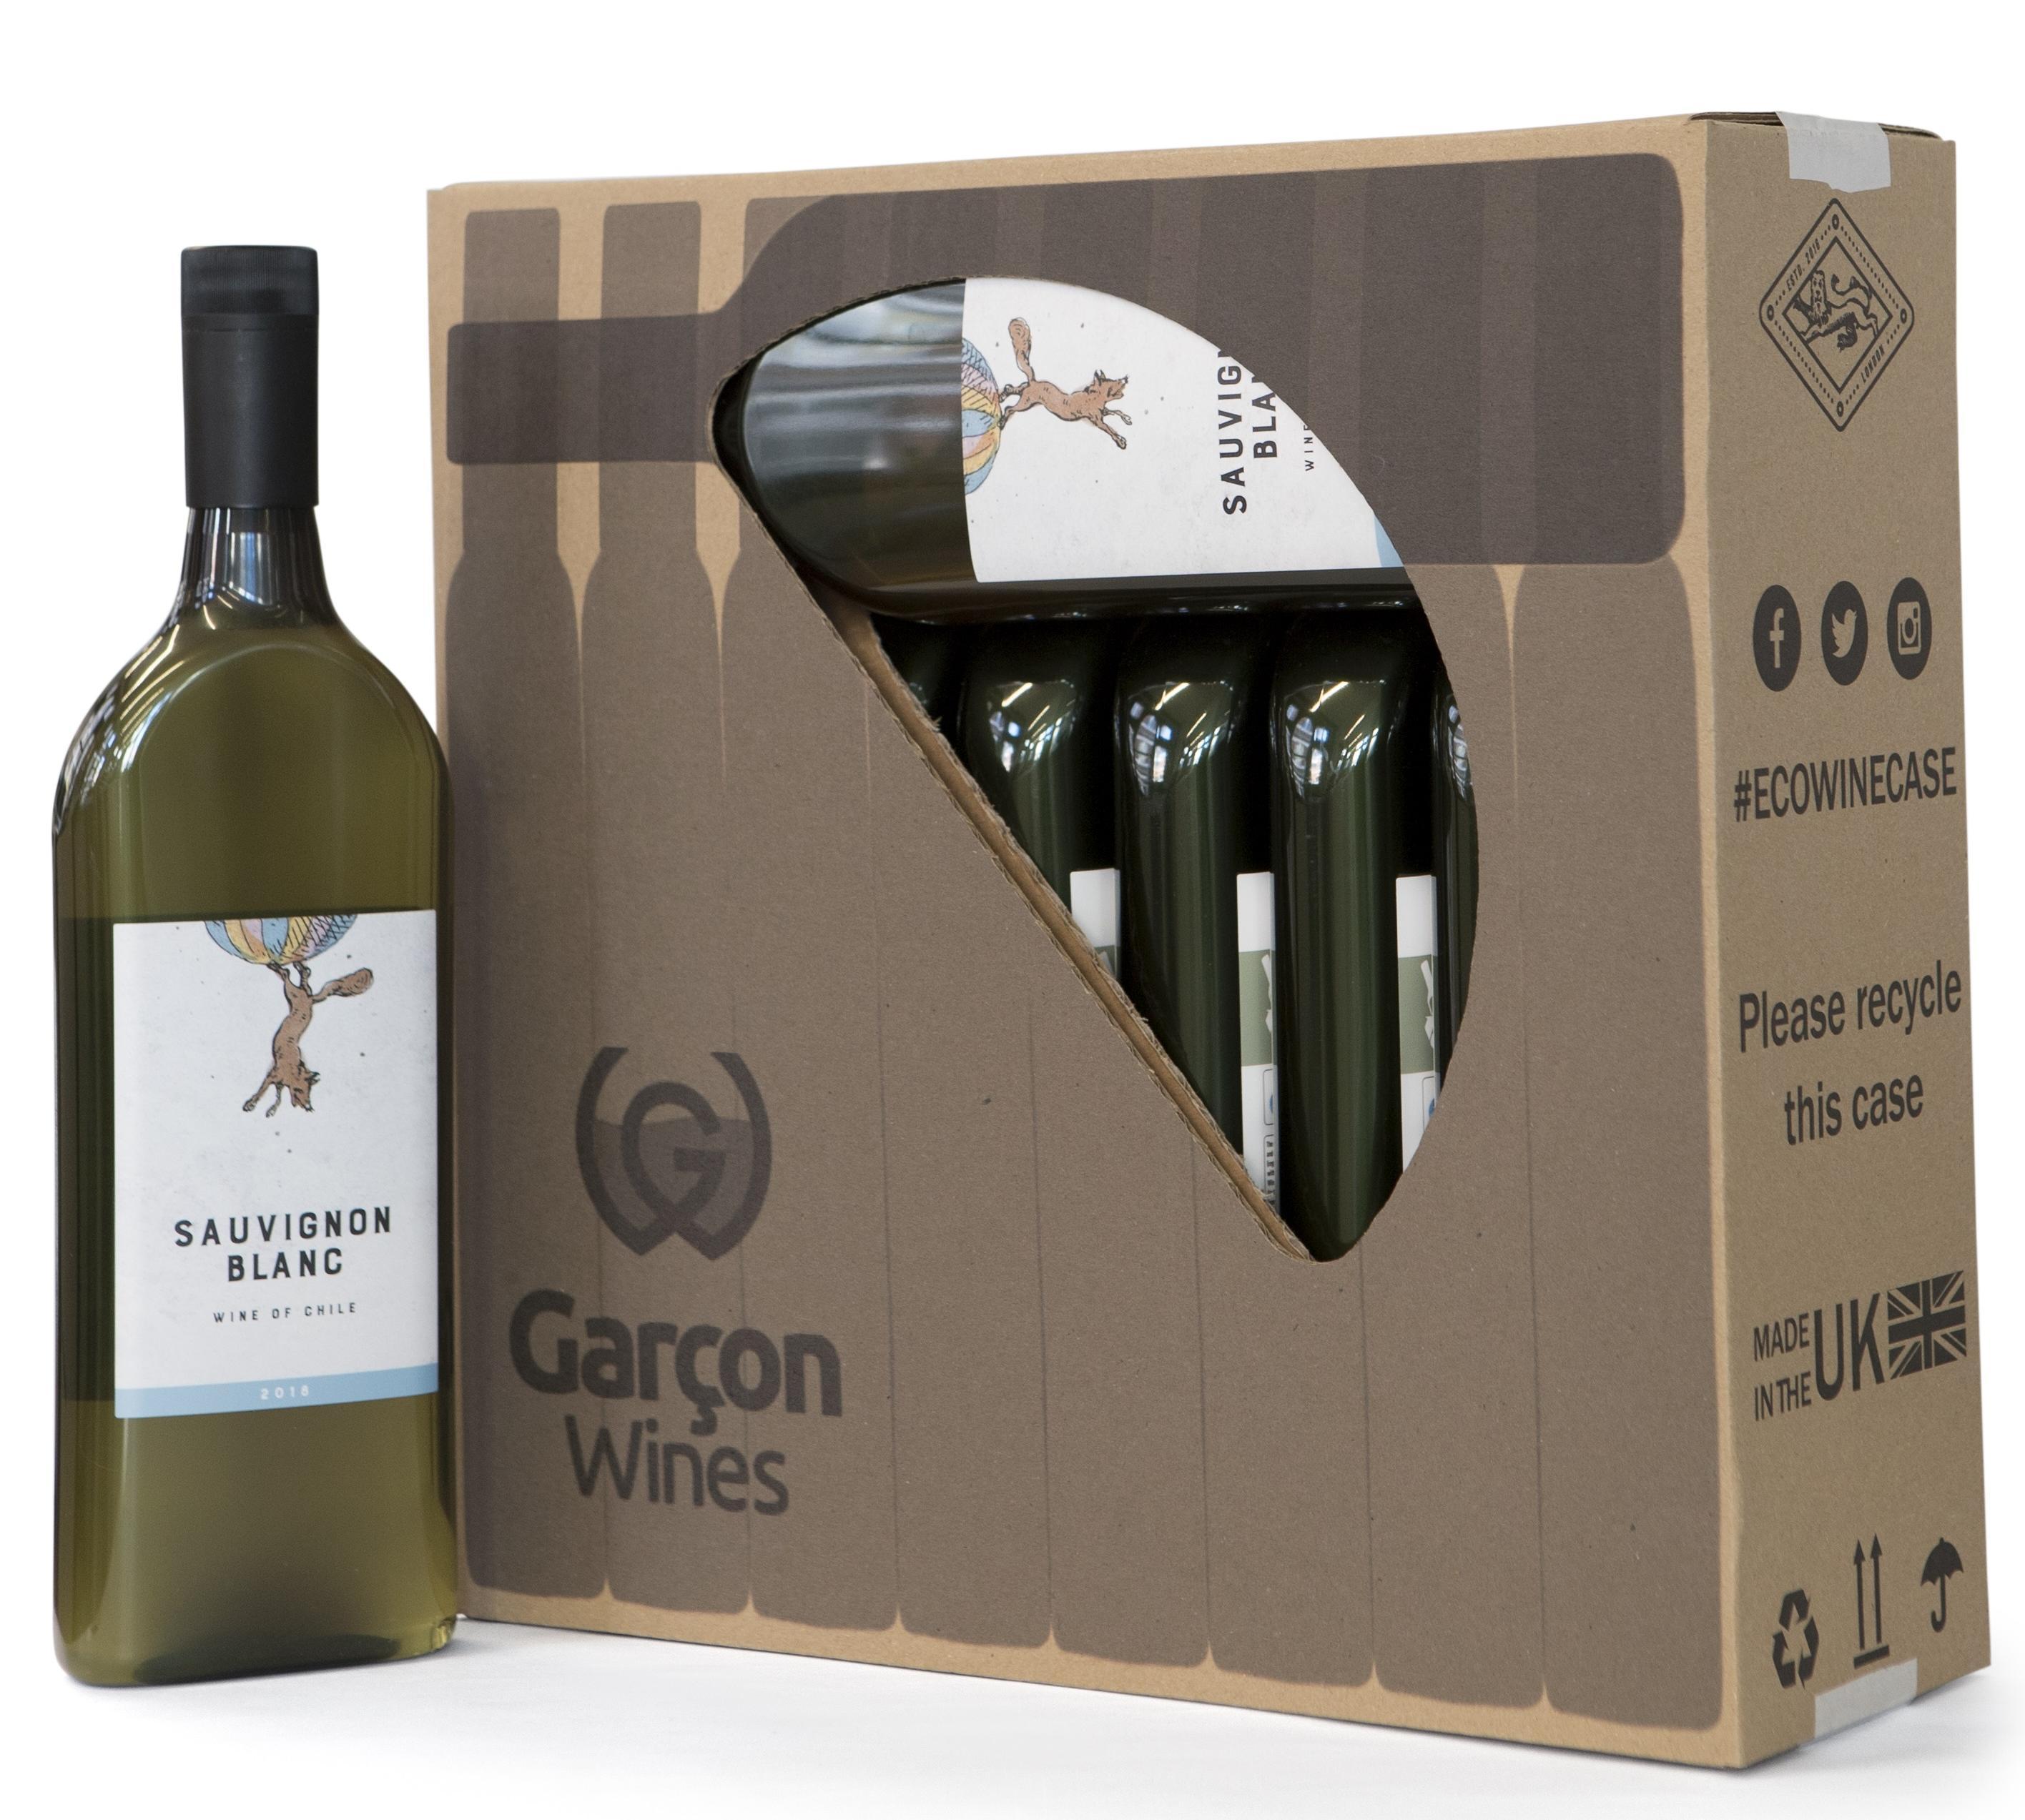 garcon_wines_10_bottles_case2.jpg